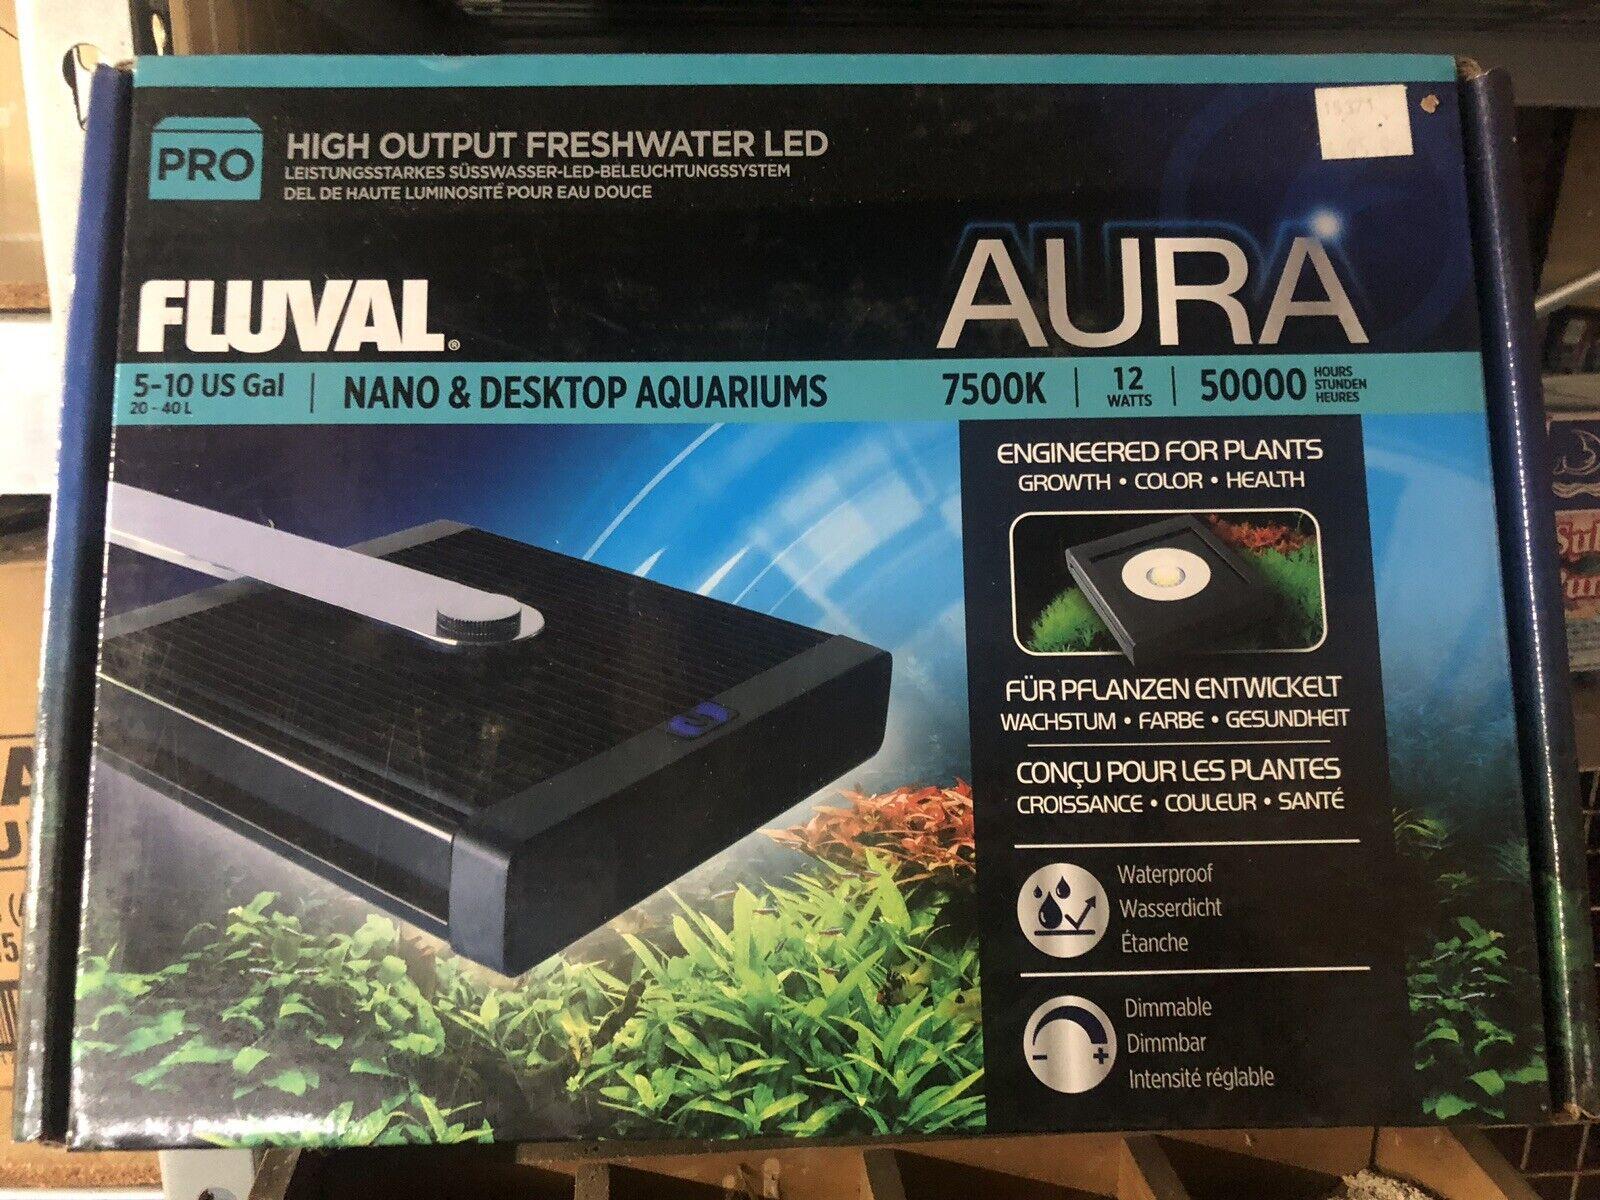 Fluval Pro Nano & Desktop Aquarium Aura High Performance LED Lamp 12w A3972